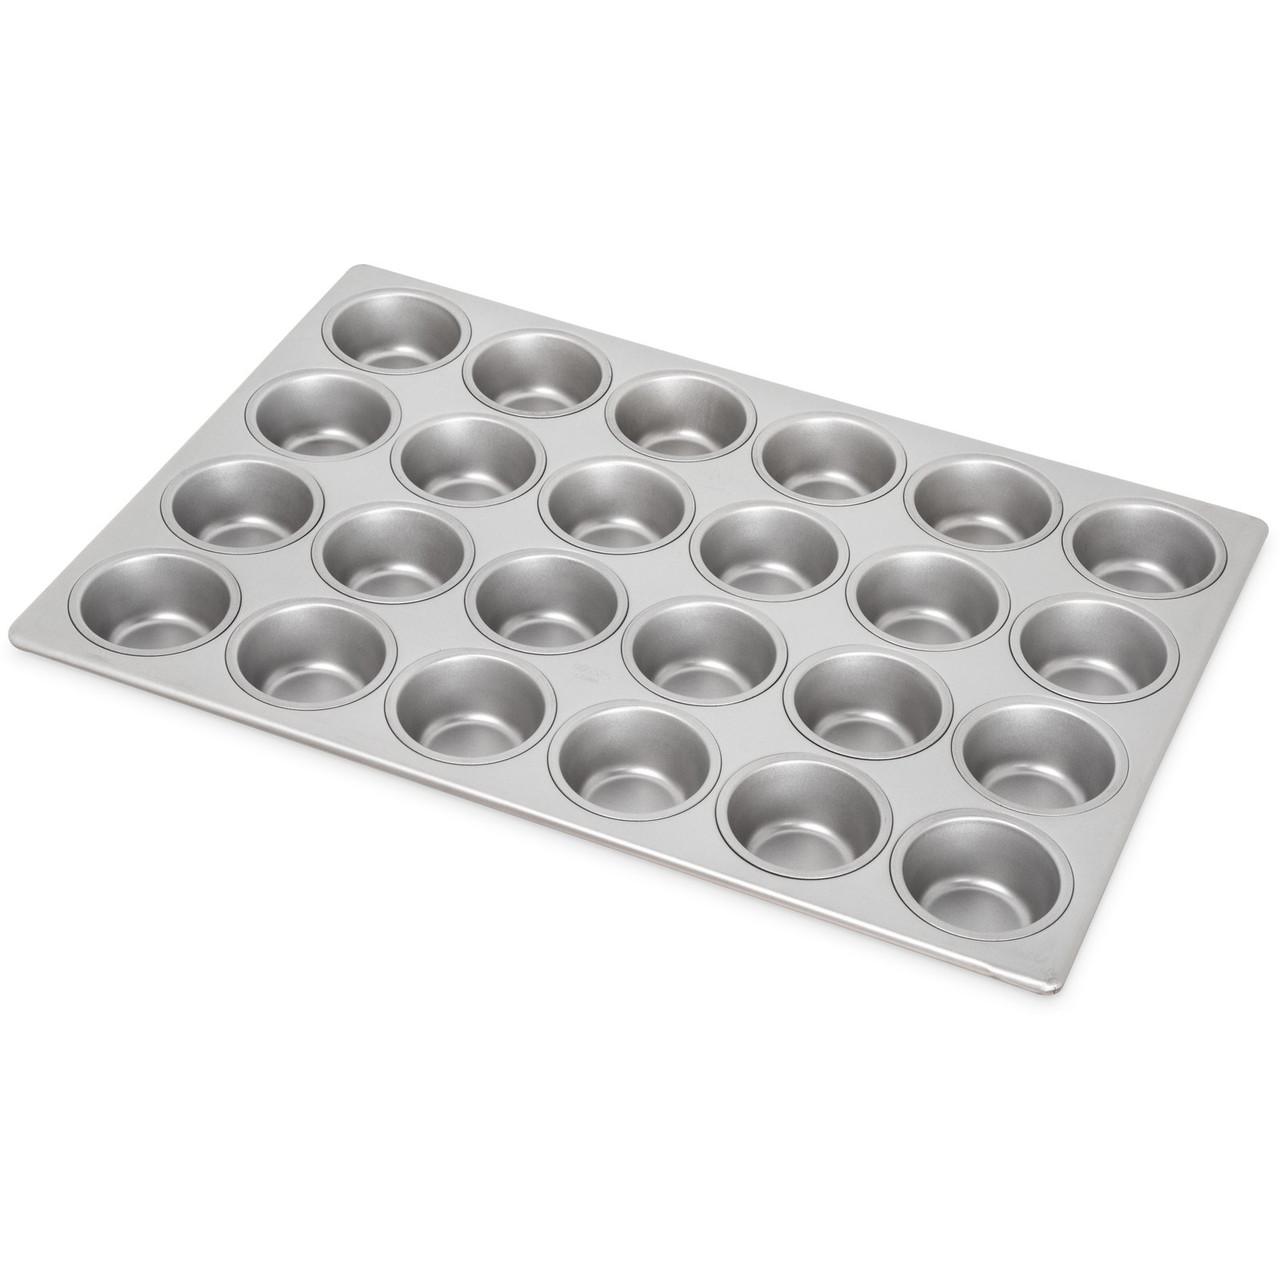 Carlisle 601840 - Steeluminum® 24 Cup Heavy-Duty Cupcake Pan 3.5 oz